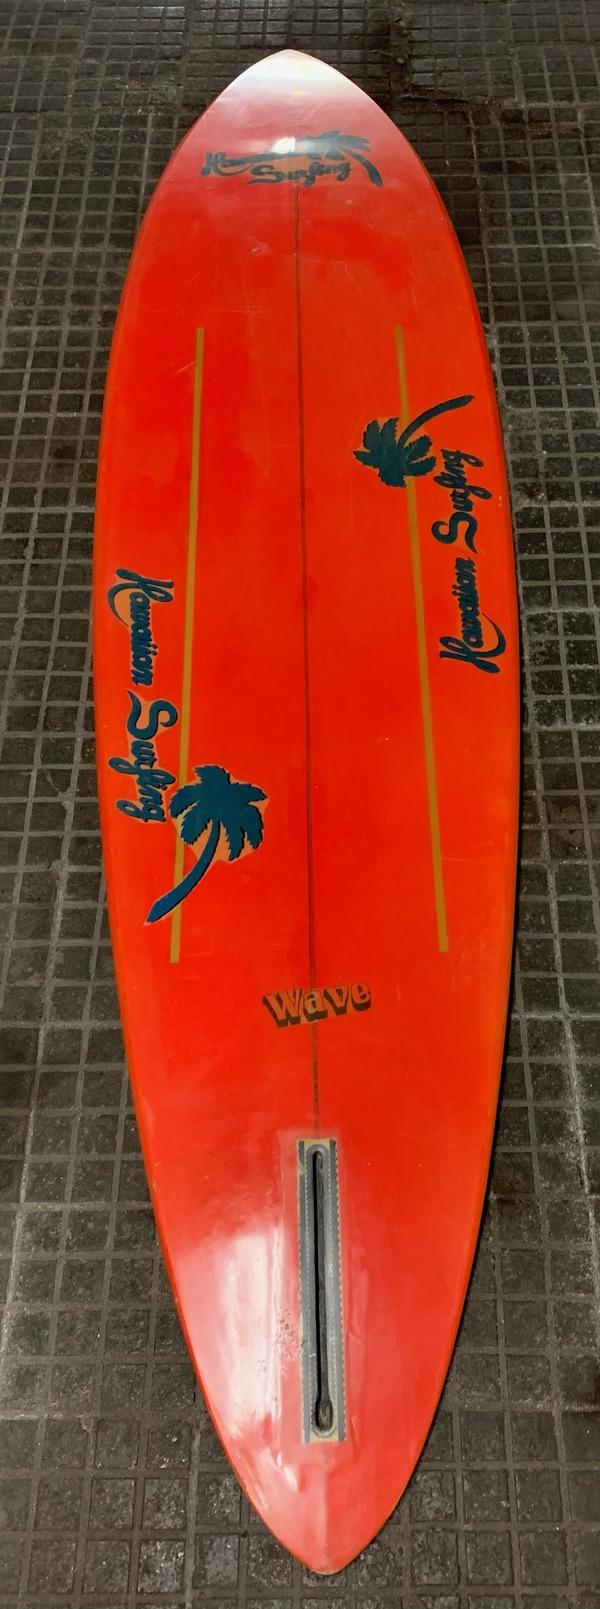 altra - Hawaiian Surfing plancetta vintage 255 con pinna